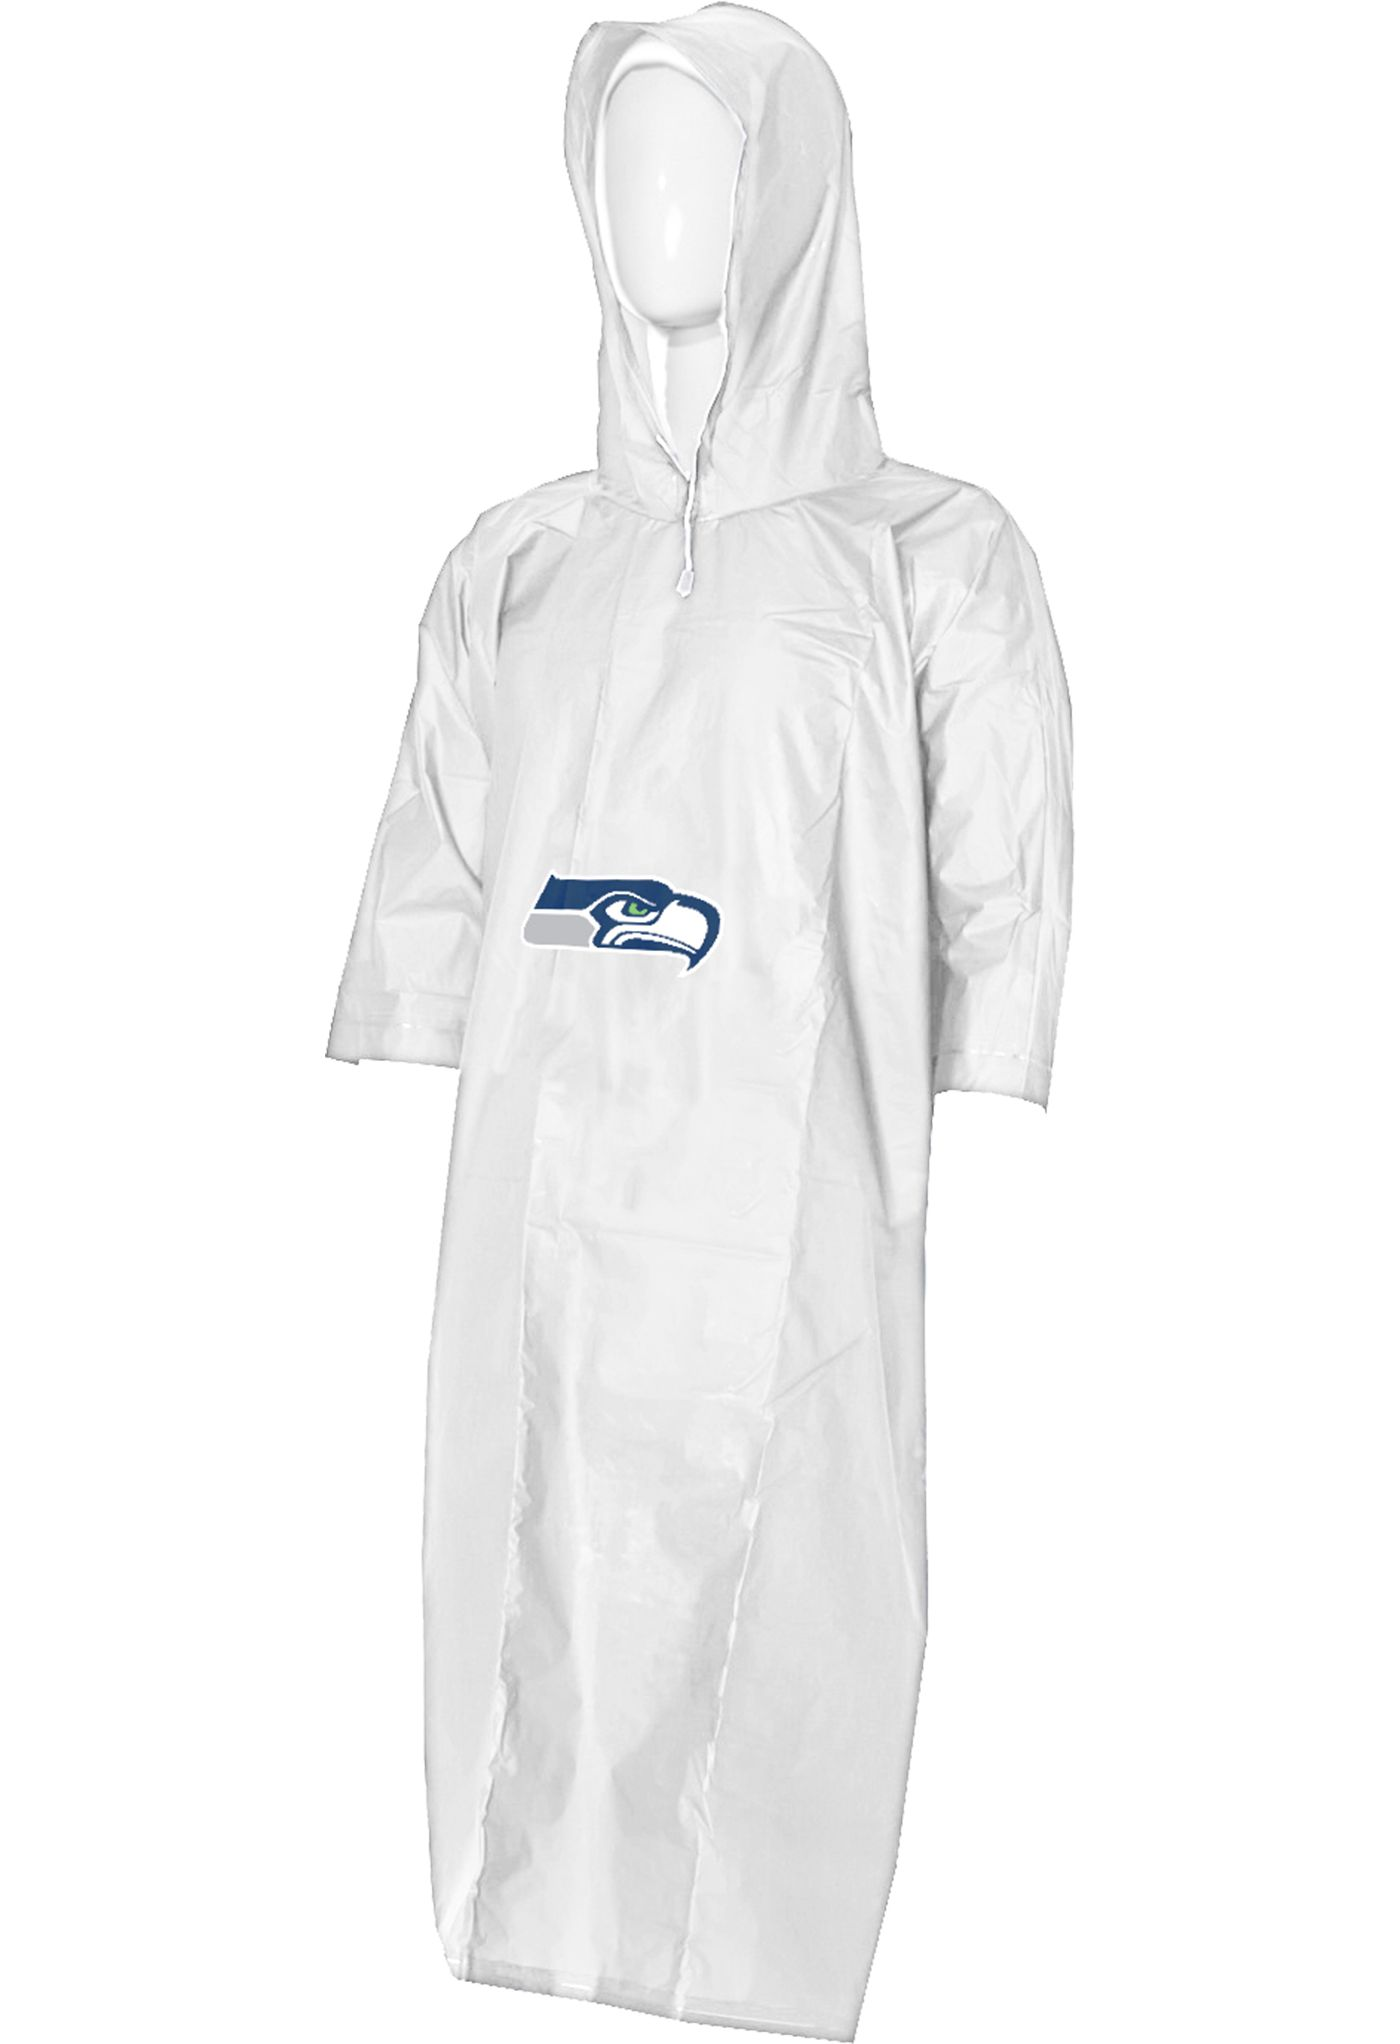 Northwest Seattle Seahawks Clear Poncho